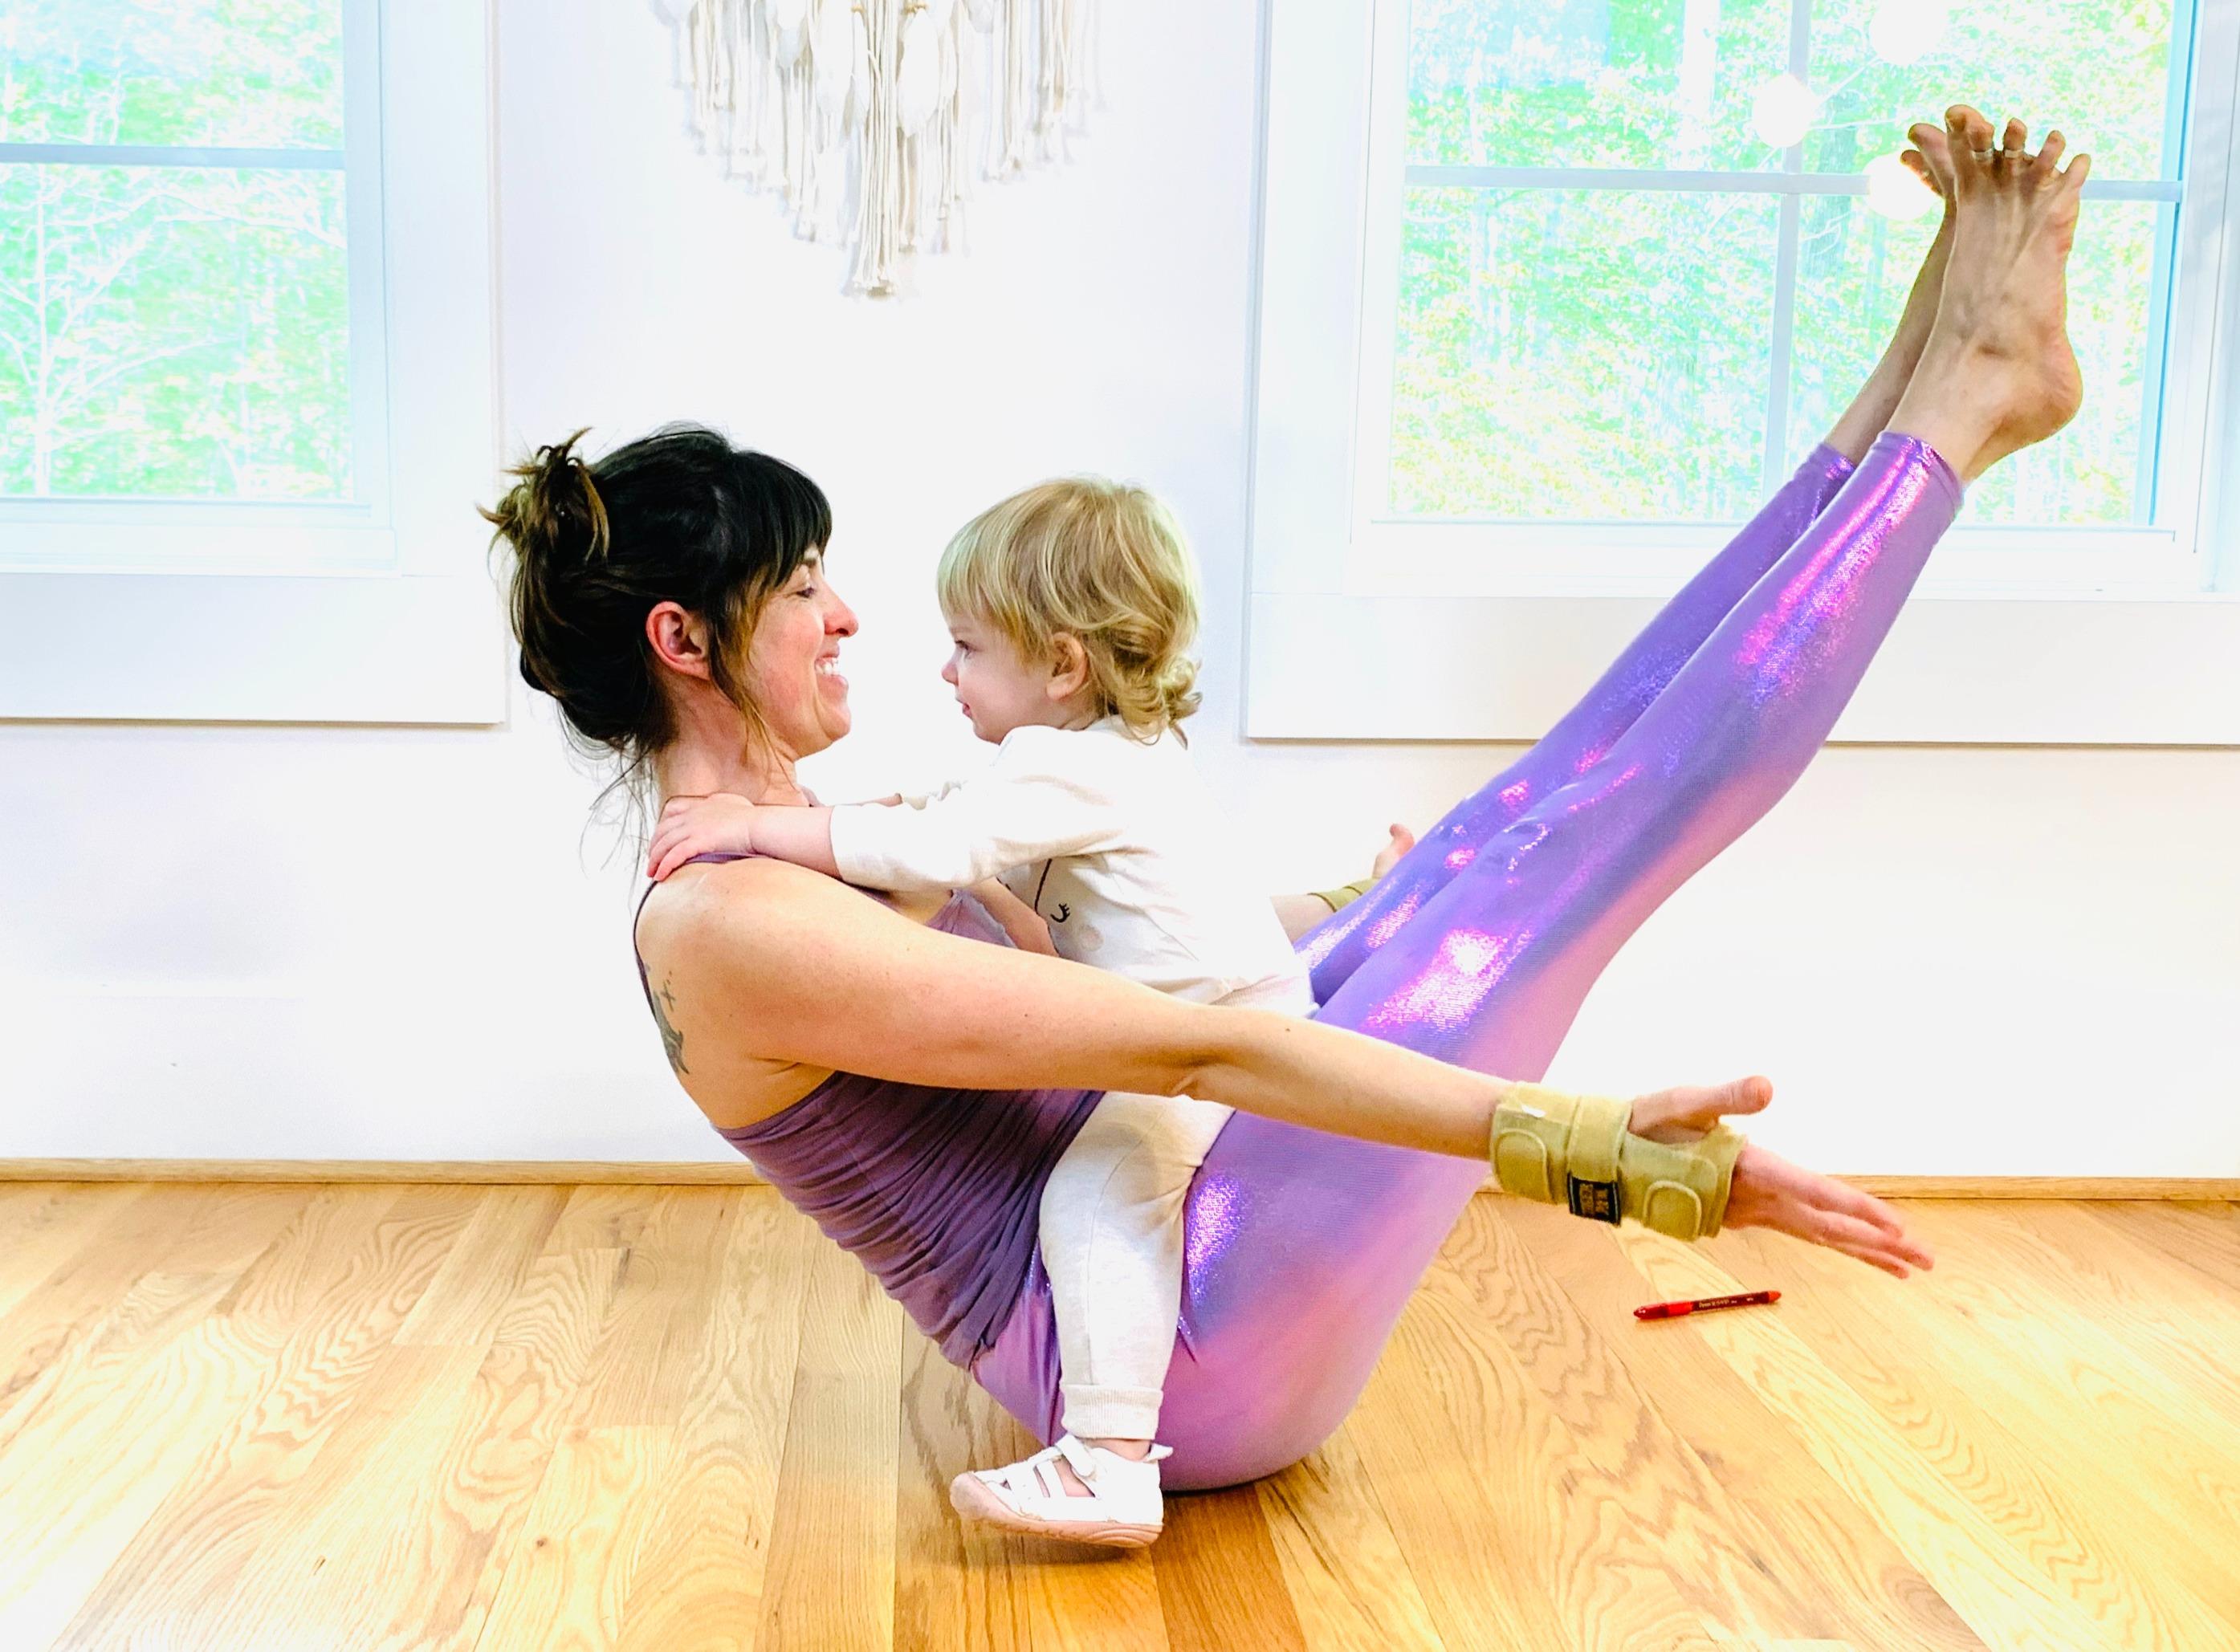 Adara loves yoga time